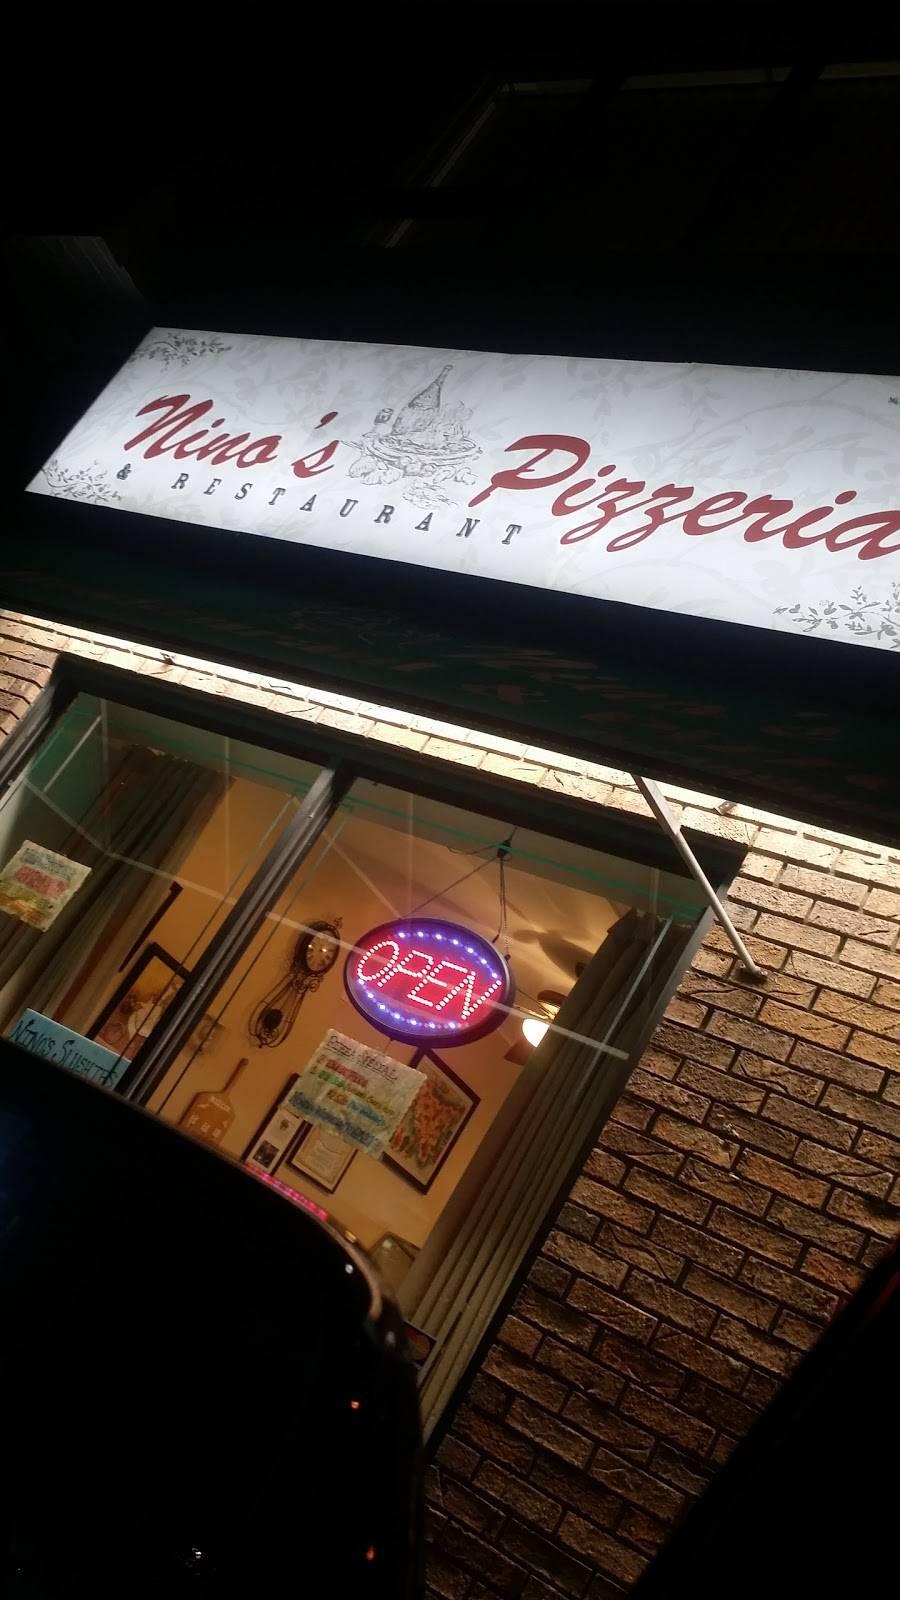 Ninos Restaurant & Pizzeria   restaurant   300 Harrison Ave #2, Lodi, NJ 07644, USA   9737725056 OR +1 973-772-5056